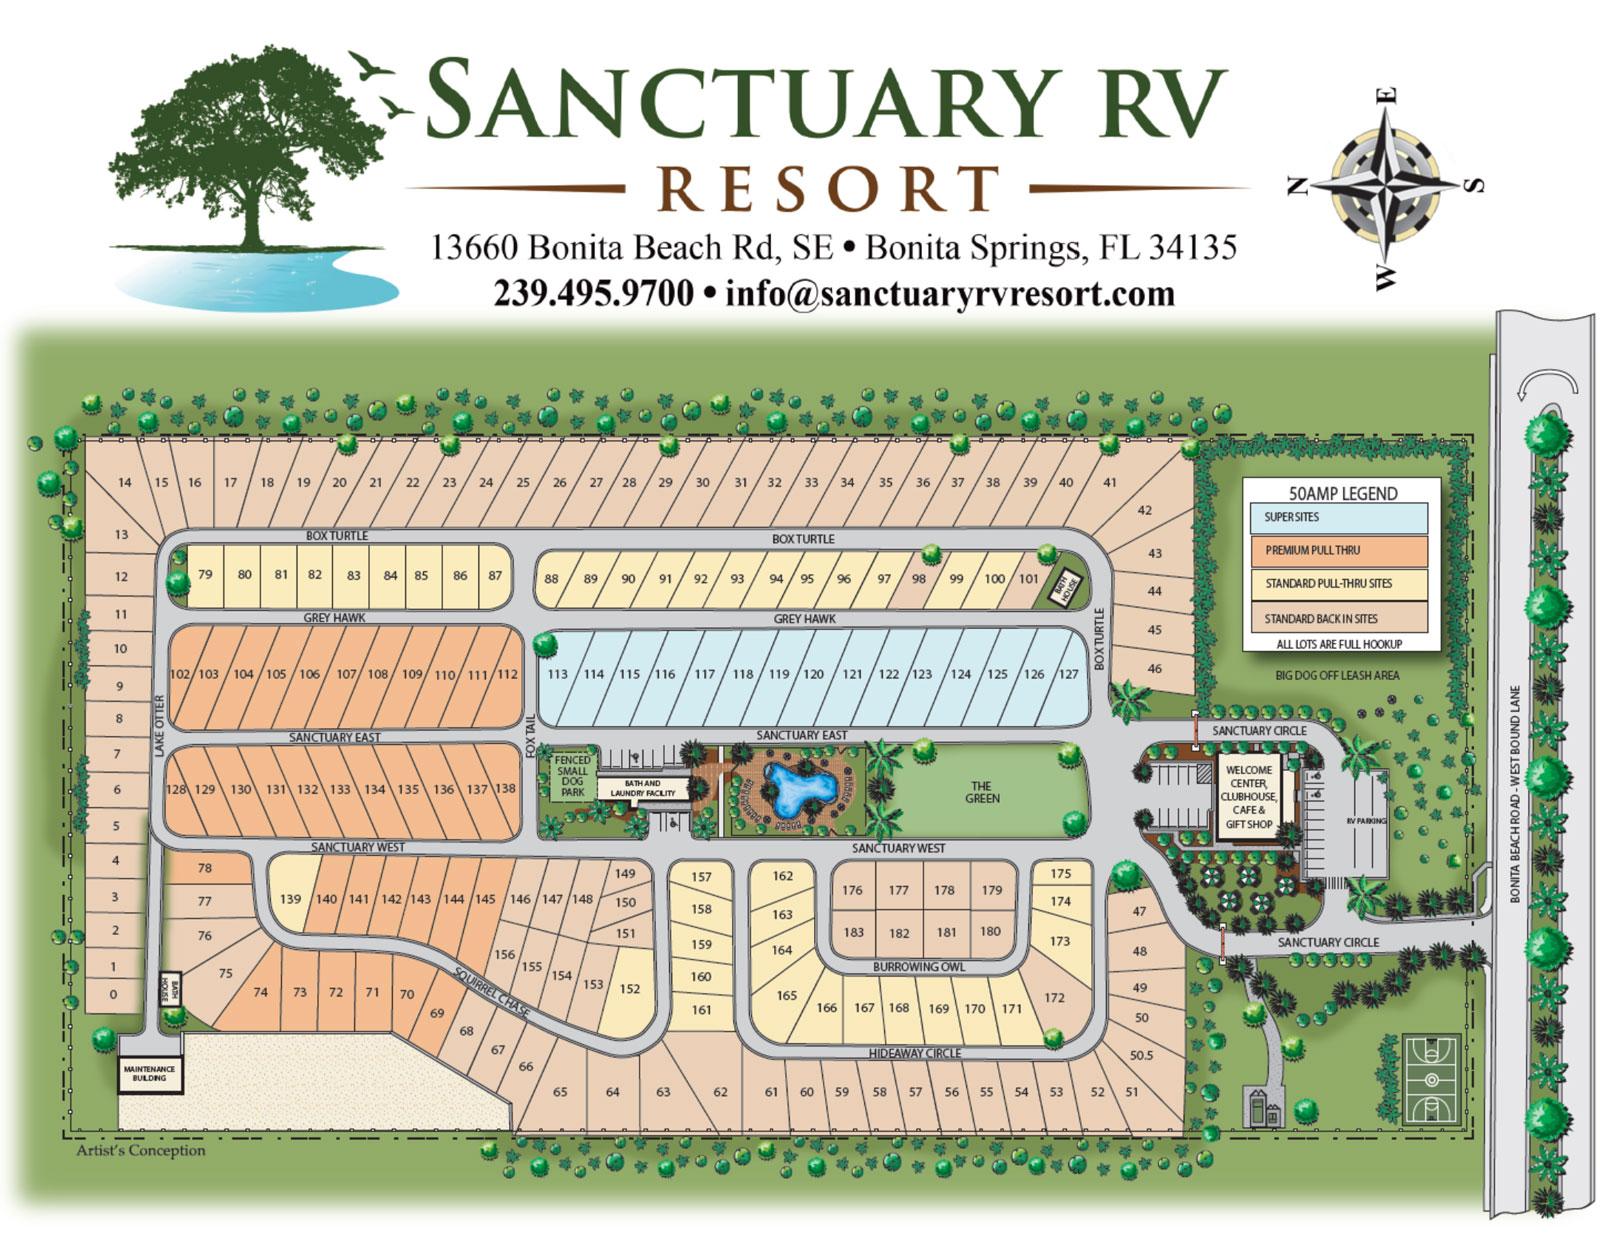 Florida Rv Parks Map Sanctuary RV Resort | Bonita Springs RV Park | Resort Map